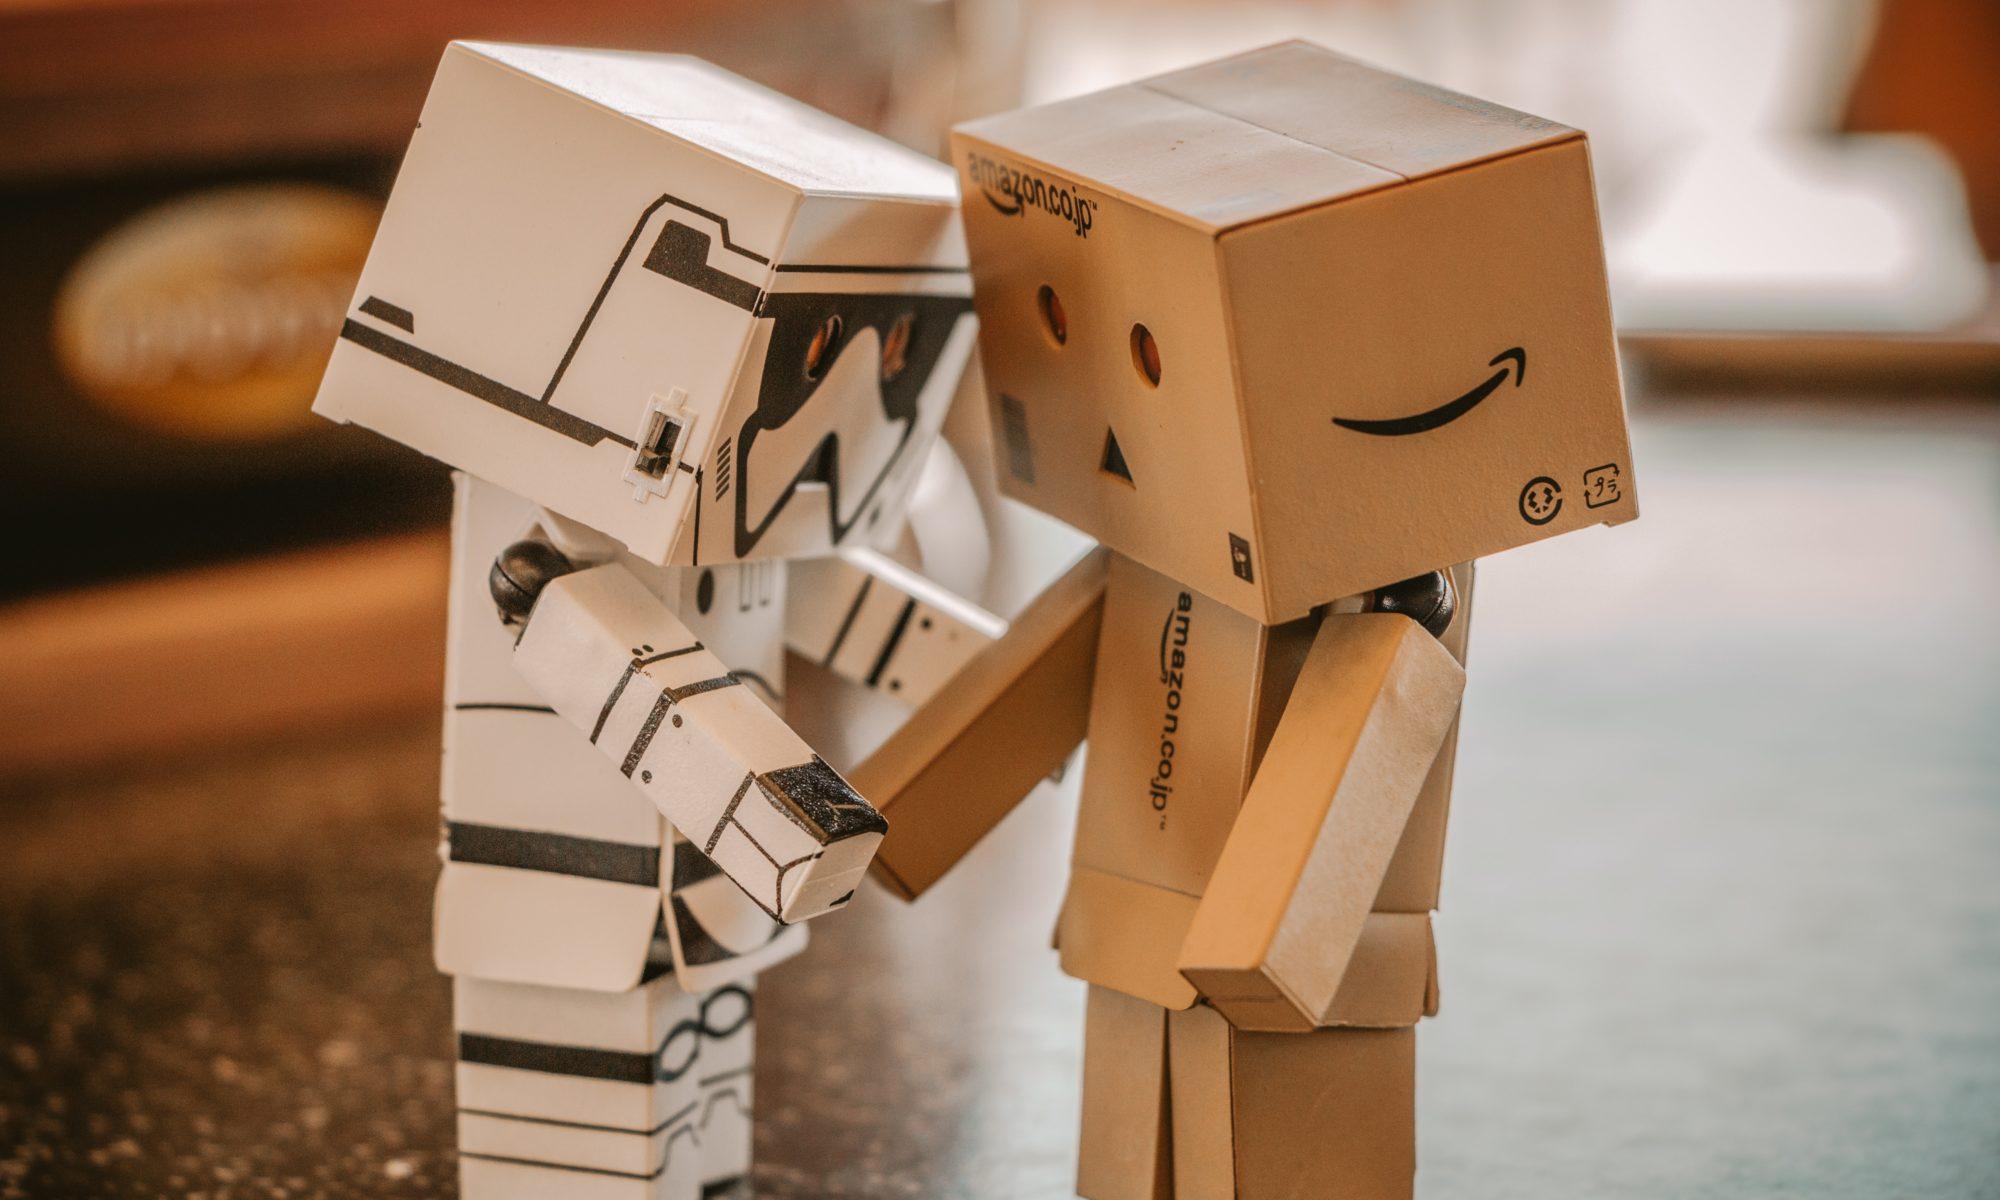 blur-boxes-cardboard-678308